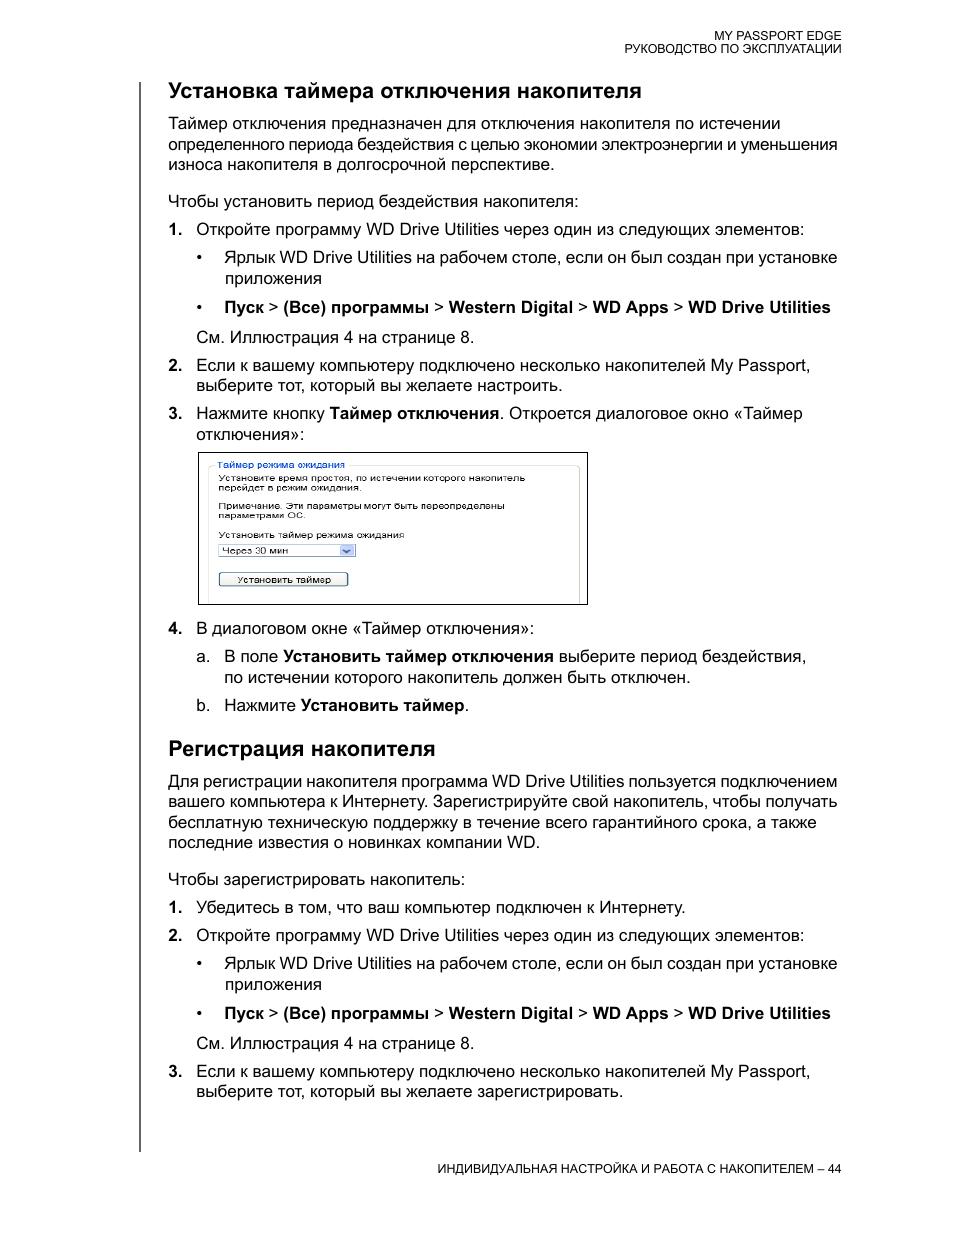 Установка таймера отключения накопителя, Регистрация